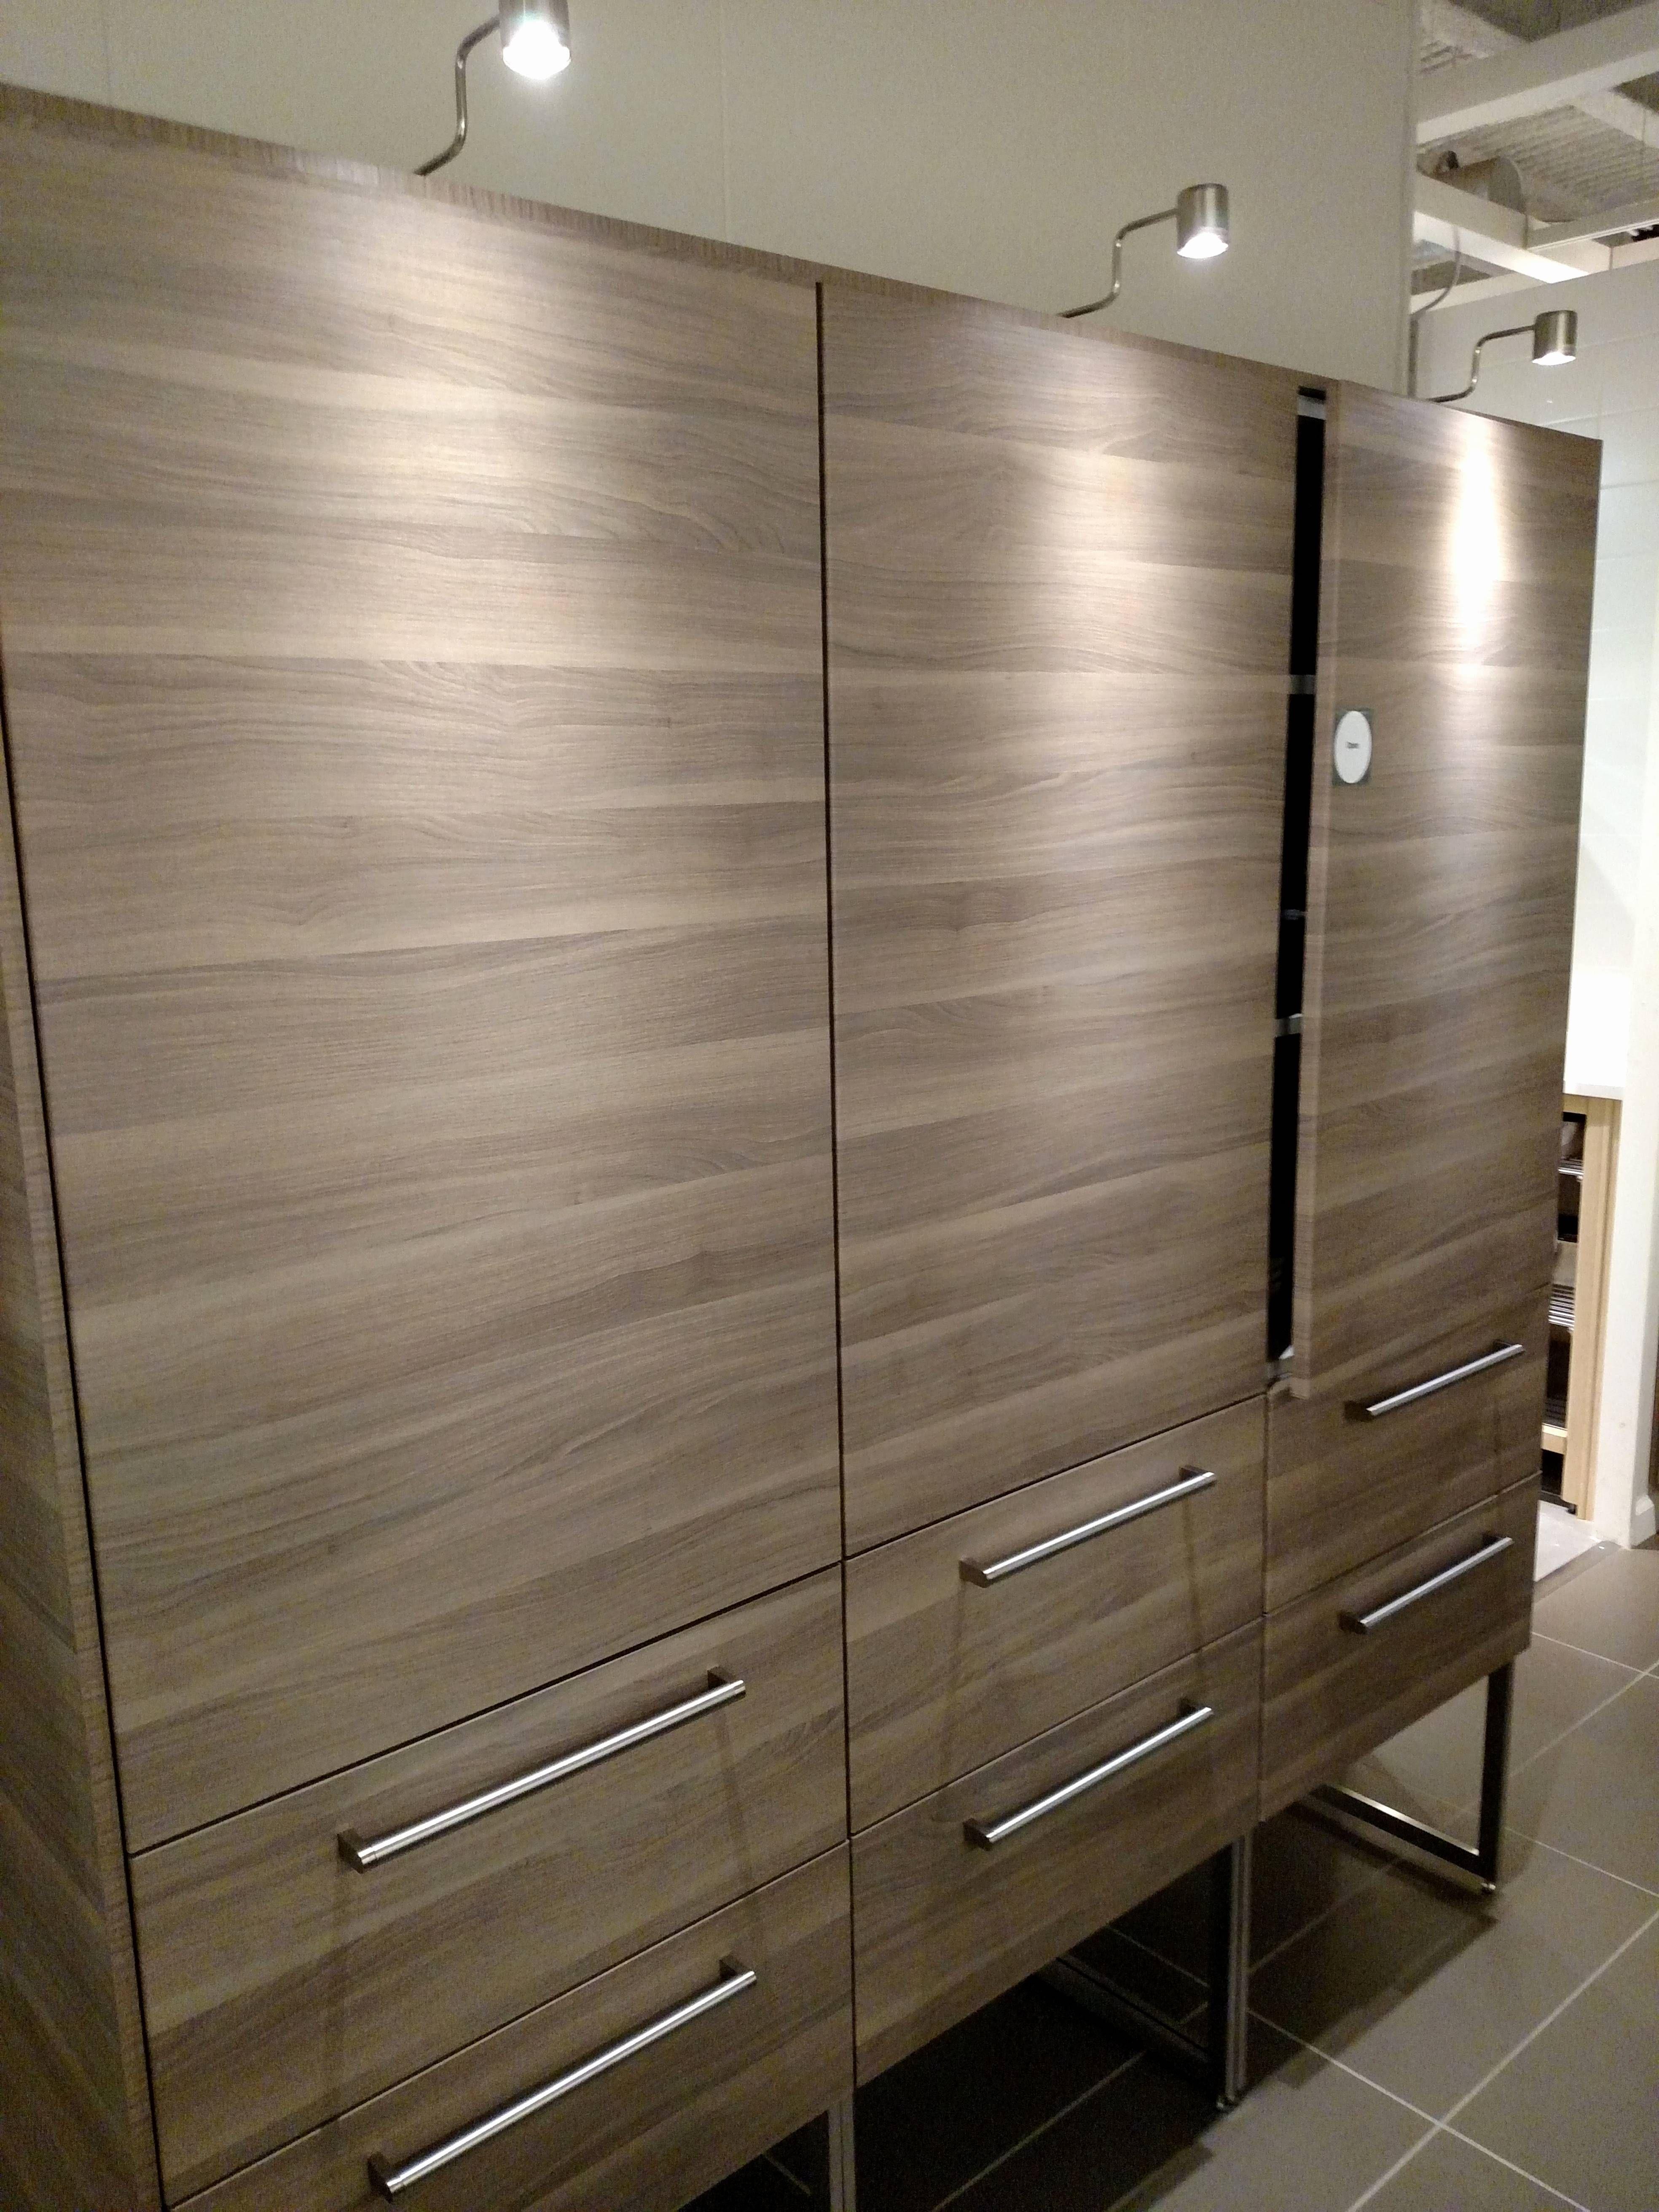 Ikea Küche Türen